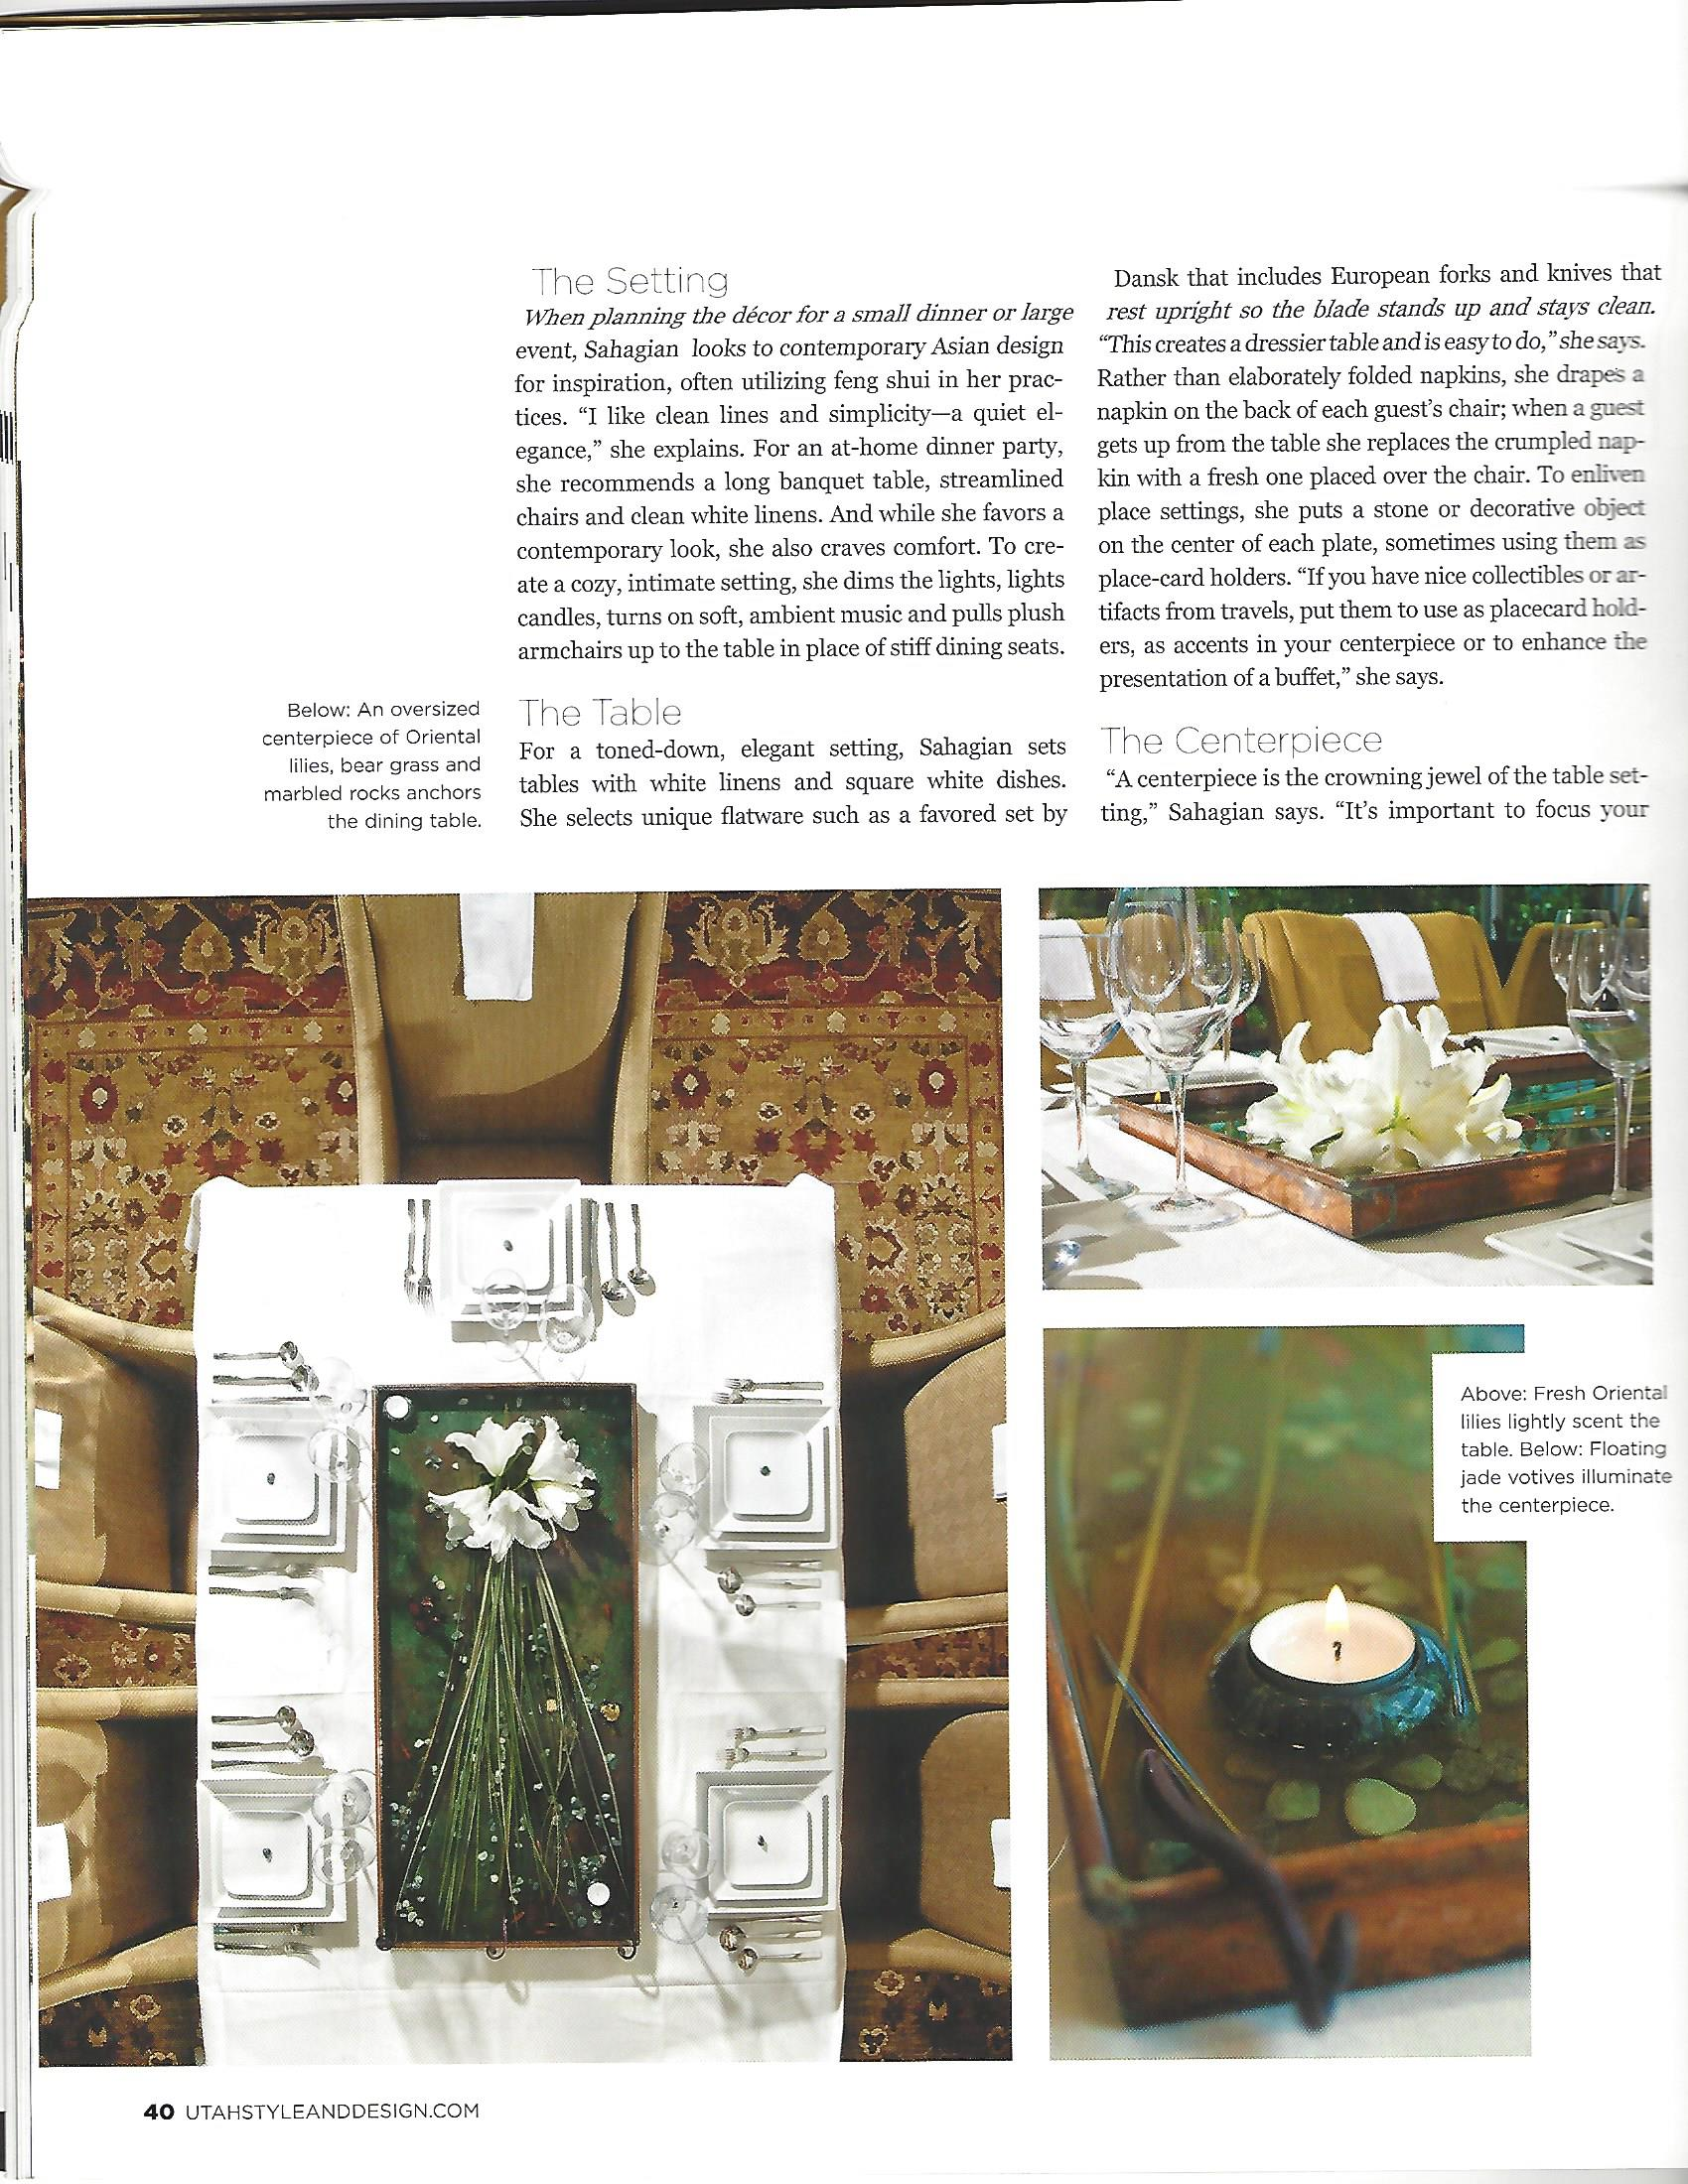 Rikka's Botanical Exhibit at Utah Museum of Fine Art (May 2009)_Page_3.jpg